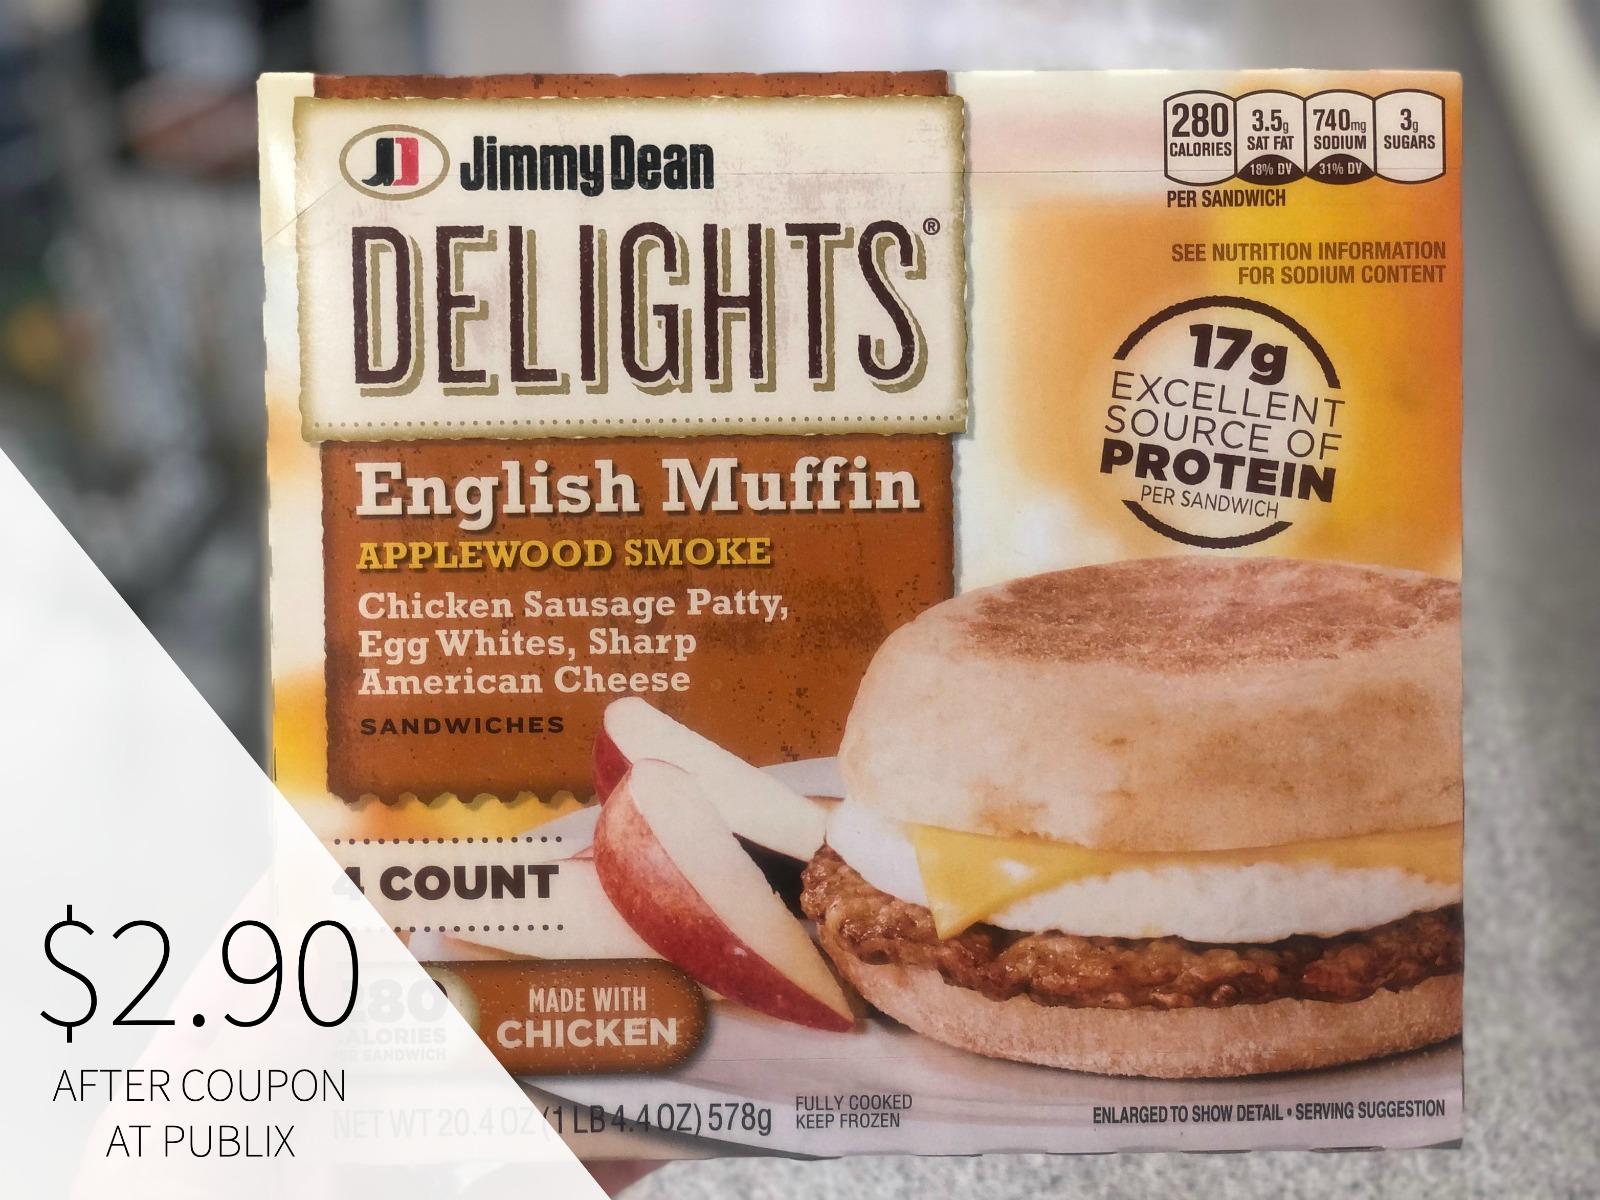 Jimmy Dean Delights Sandwiches Just $2.50 At Publix on I Heart Publix 3